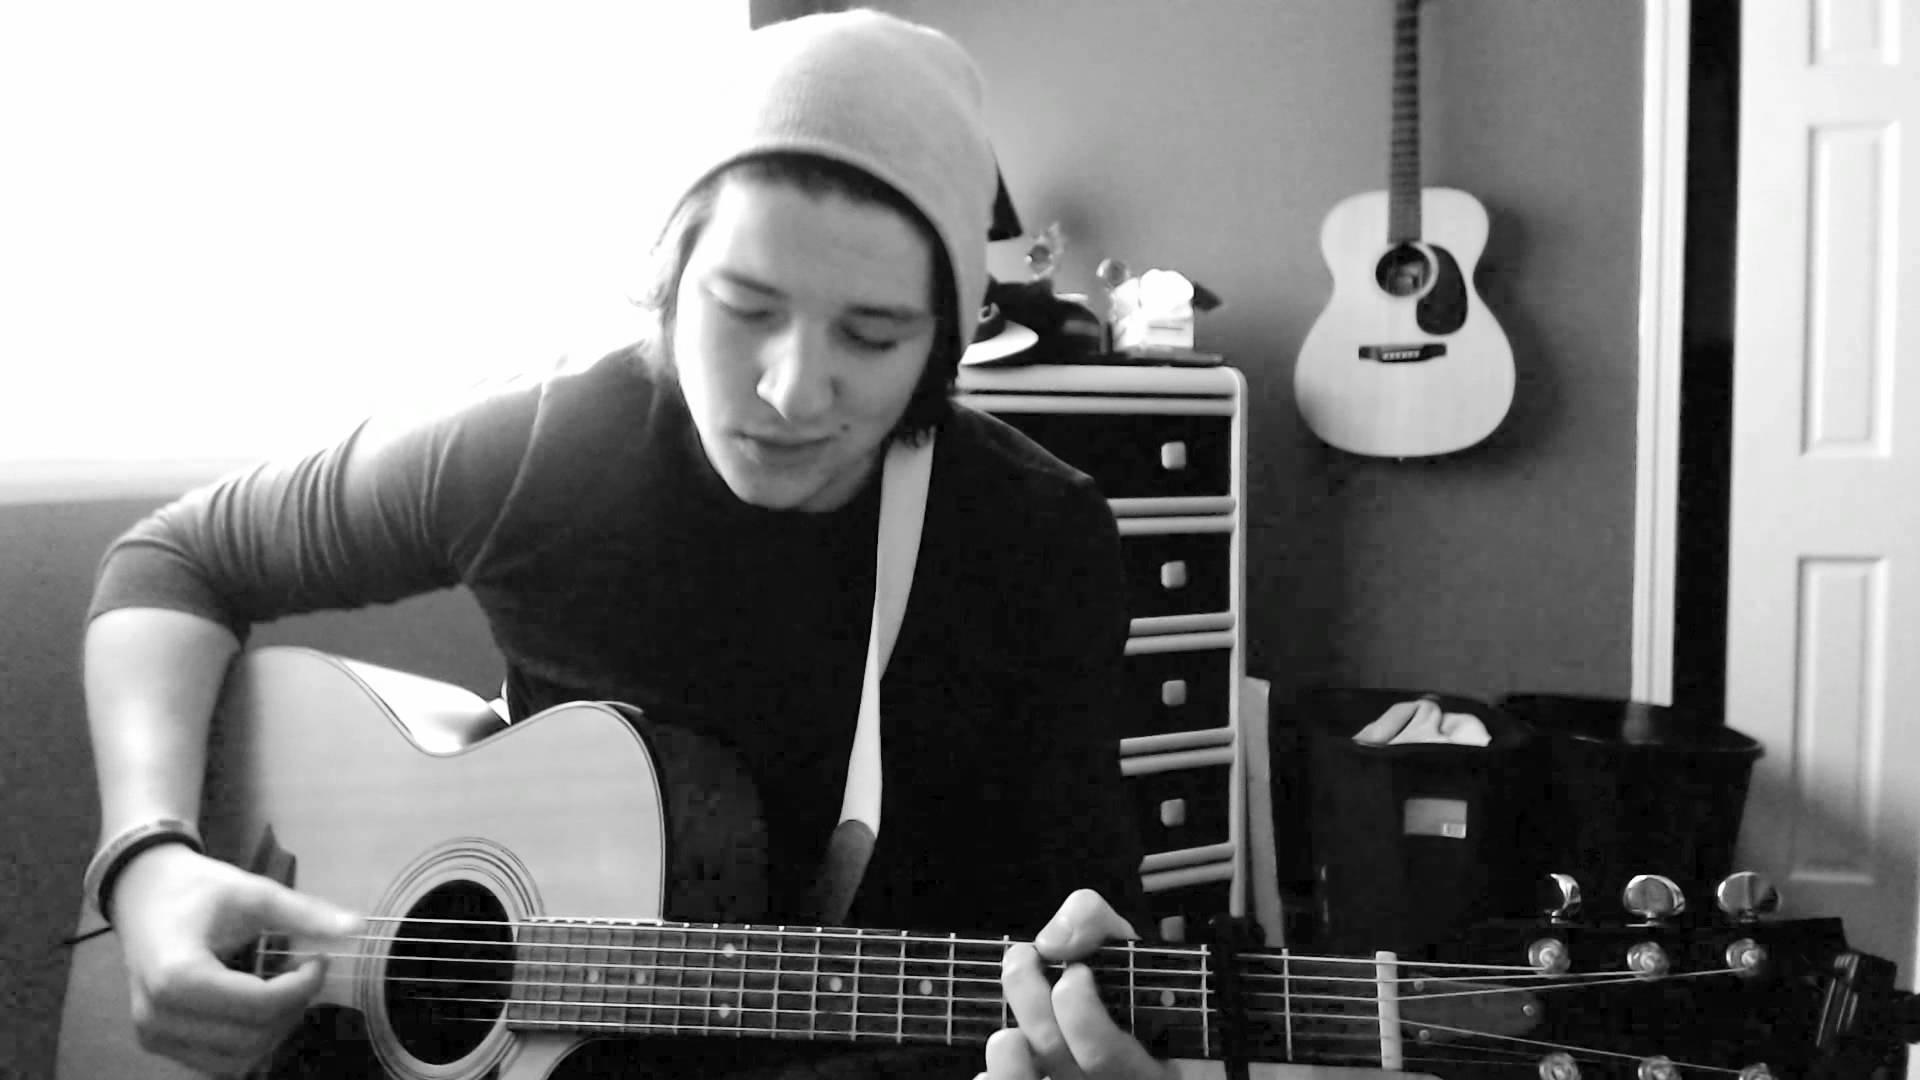 Jason Mraz – After An Afternoon Lyrics | Genius Lyrics